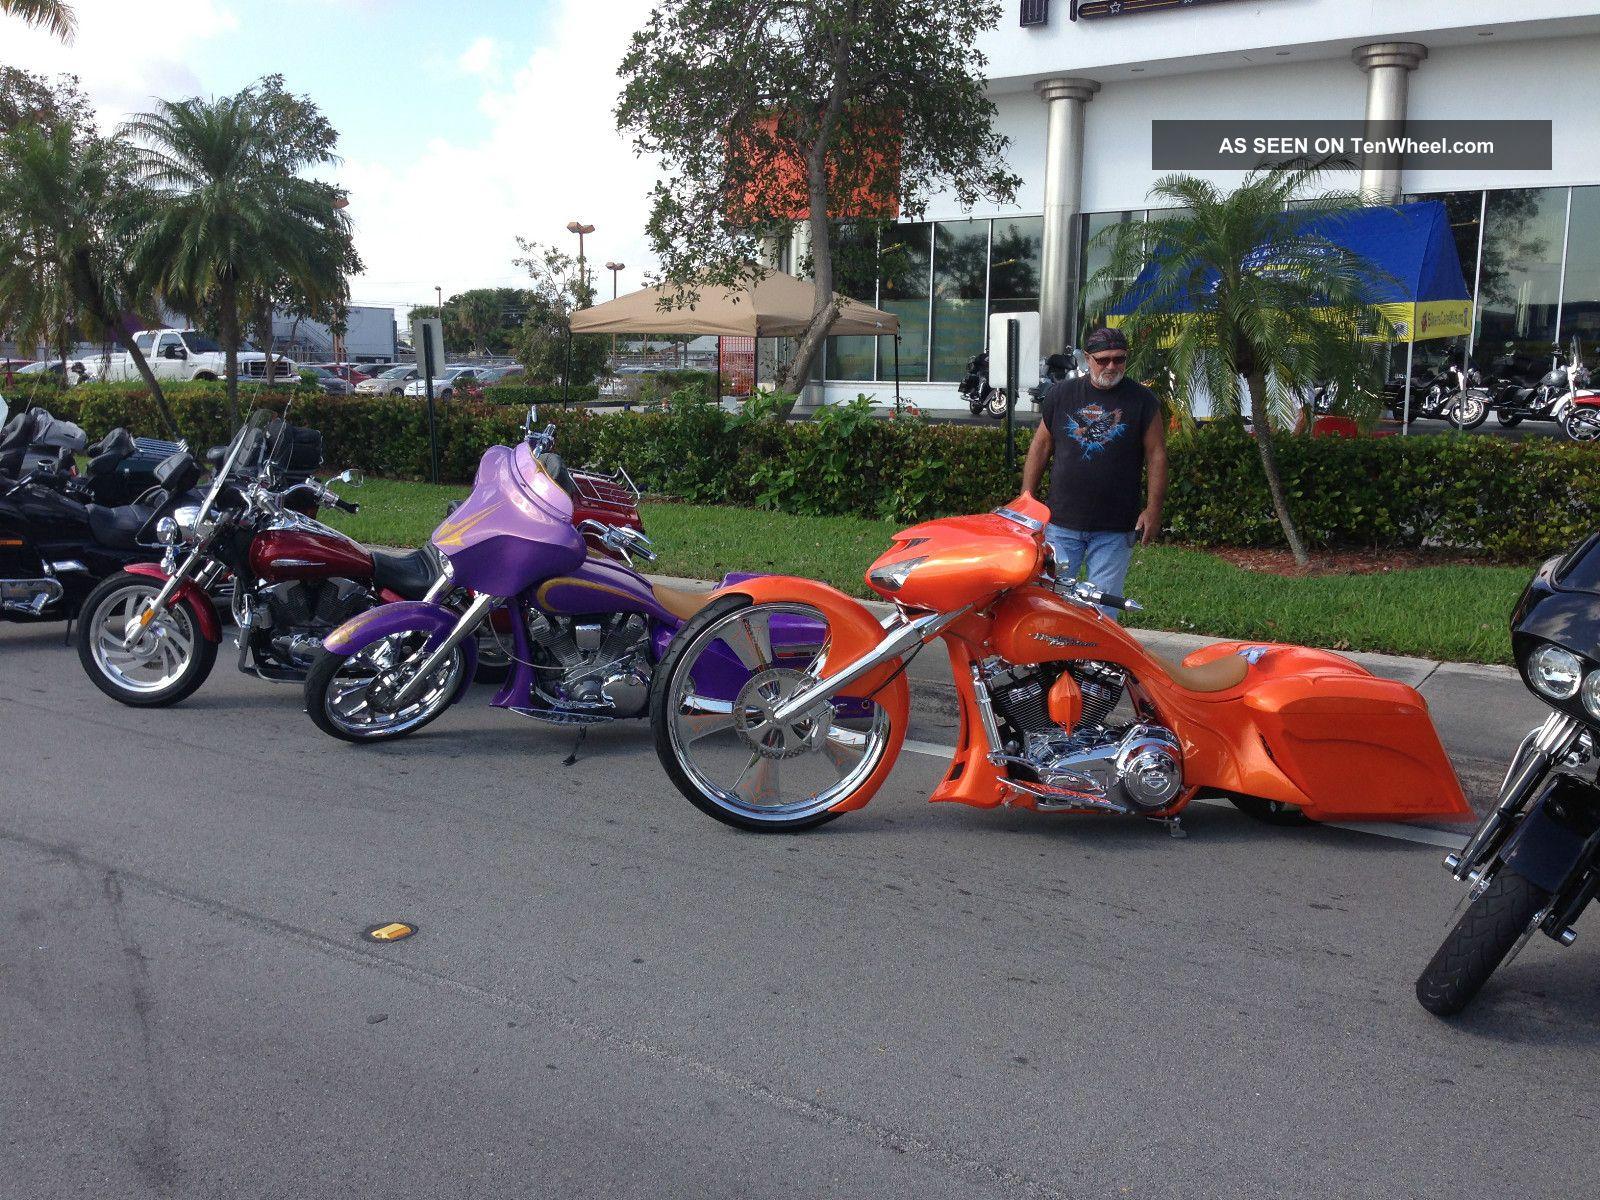 Custom Bagger Harley Who 2006 Yamaha Roadstar 1700